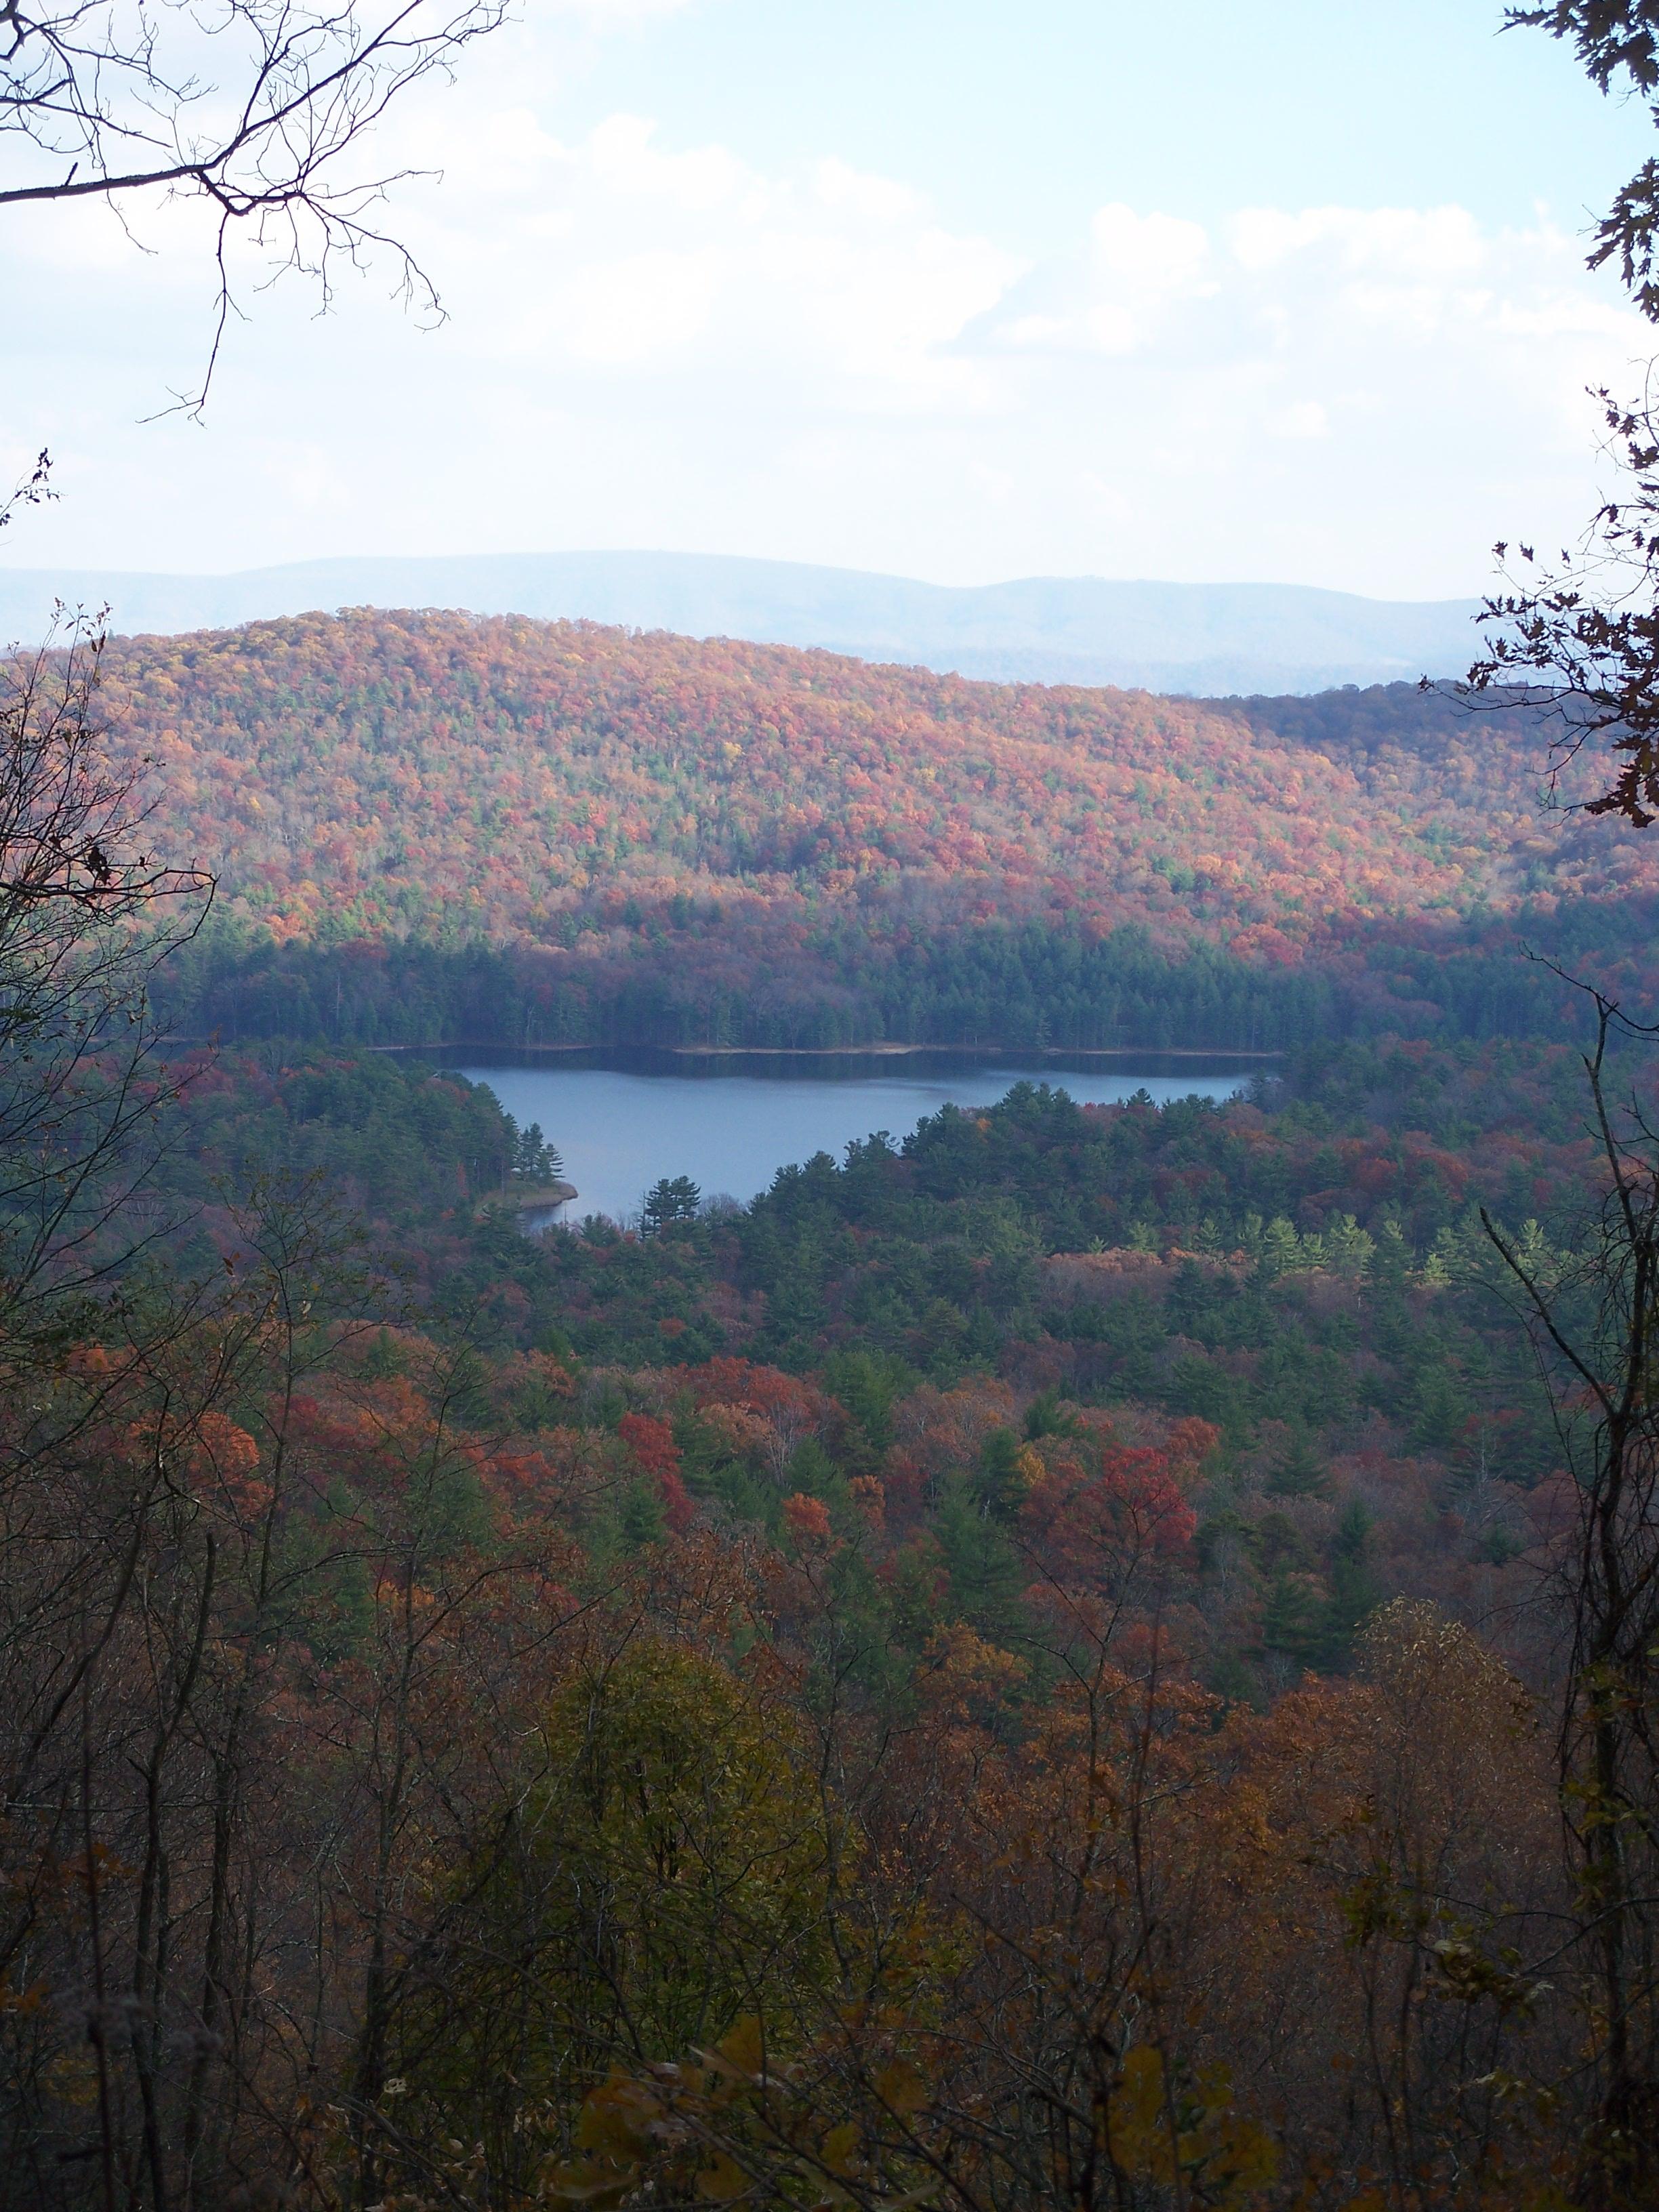 Lake Sherwood from ALT - By Doug Wood